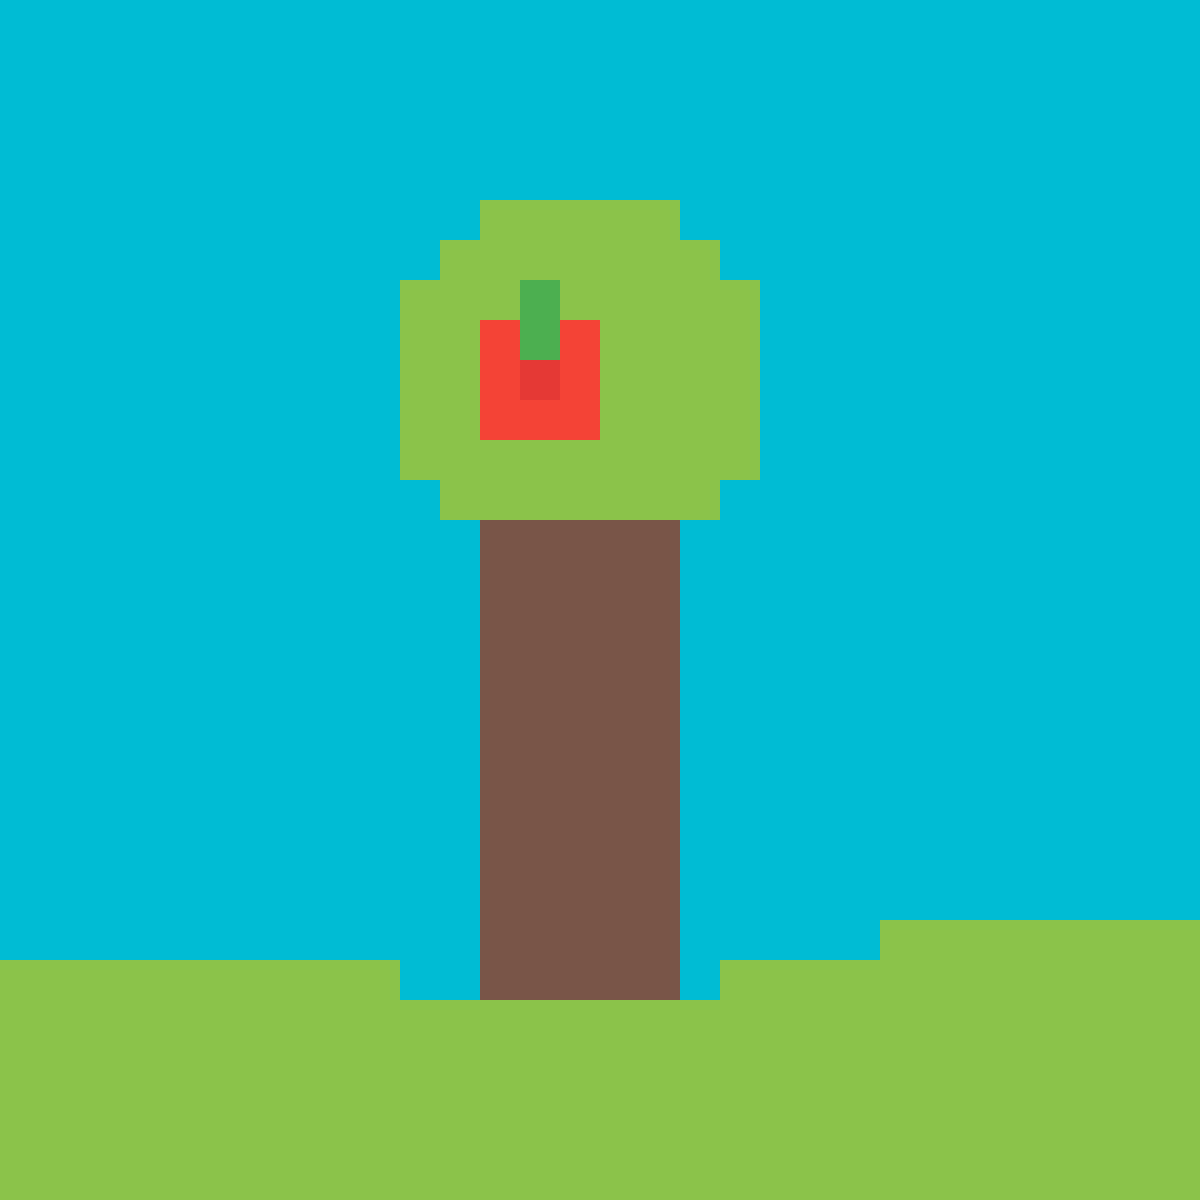 30x30 Tree by Gilbertson